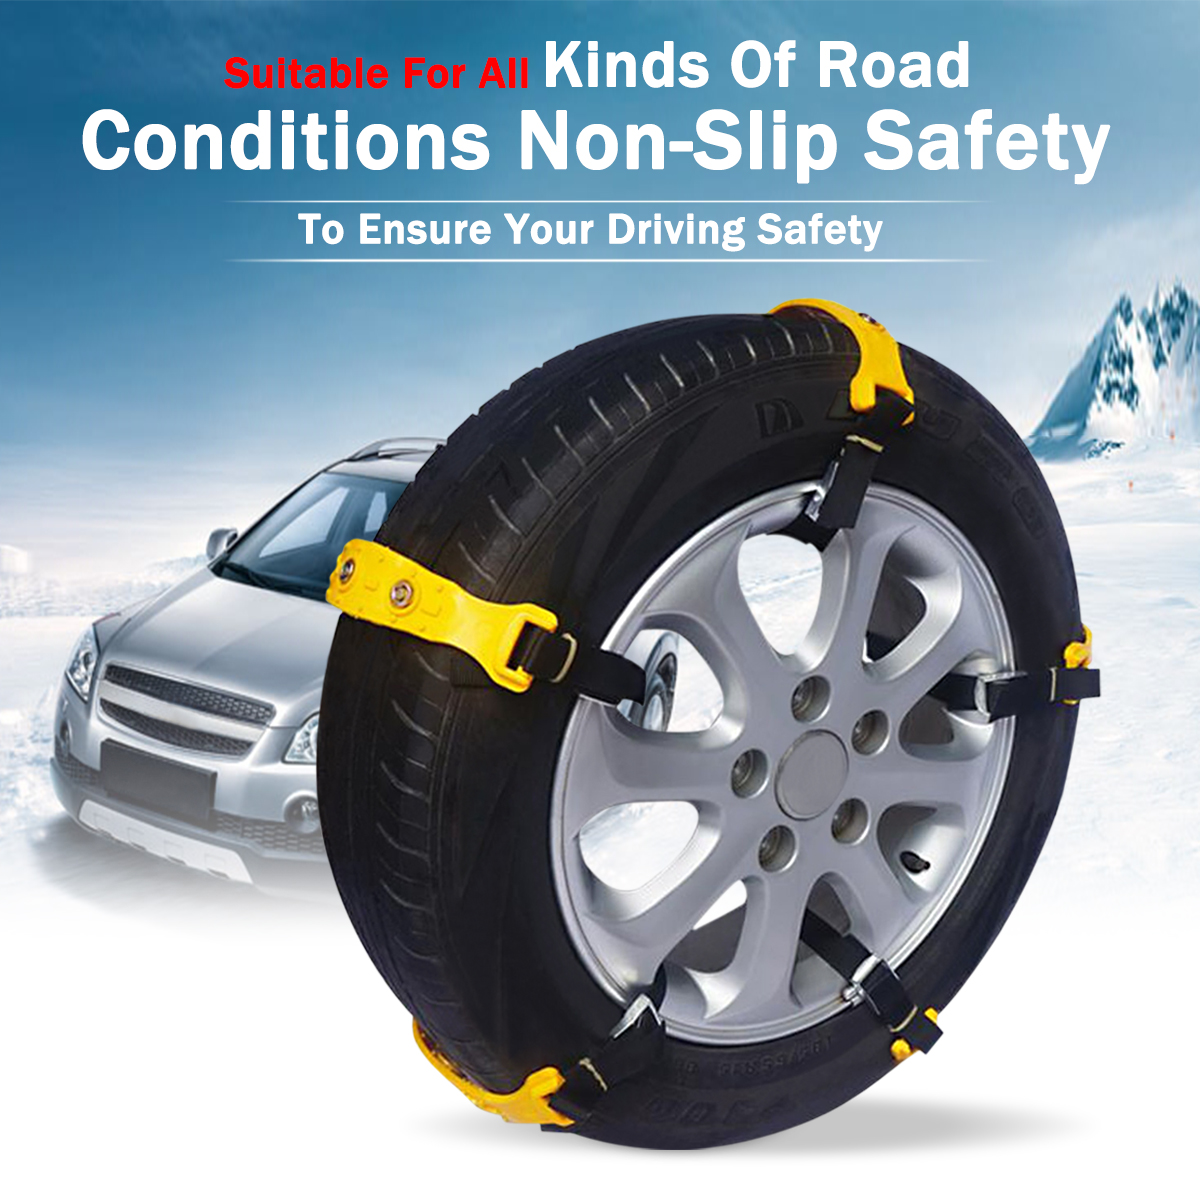 10pcs/set Car Yellow Tire Snow Chains Beef Tendon VAN Wheel Tyre Anti-skid TPU Chains 37 x 4.7cm10pcs/set Car Yellow Tire Snow Chains Beef Tendon VAN Wheel Tyre Anti-skid TPU Chains 37 x 4.7cm